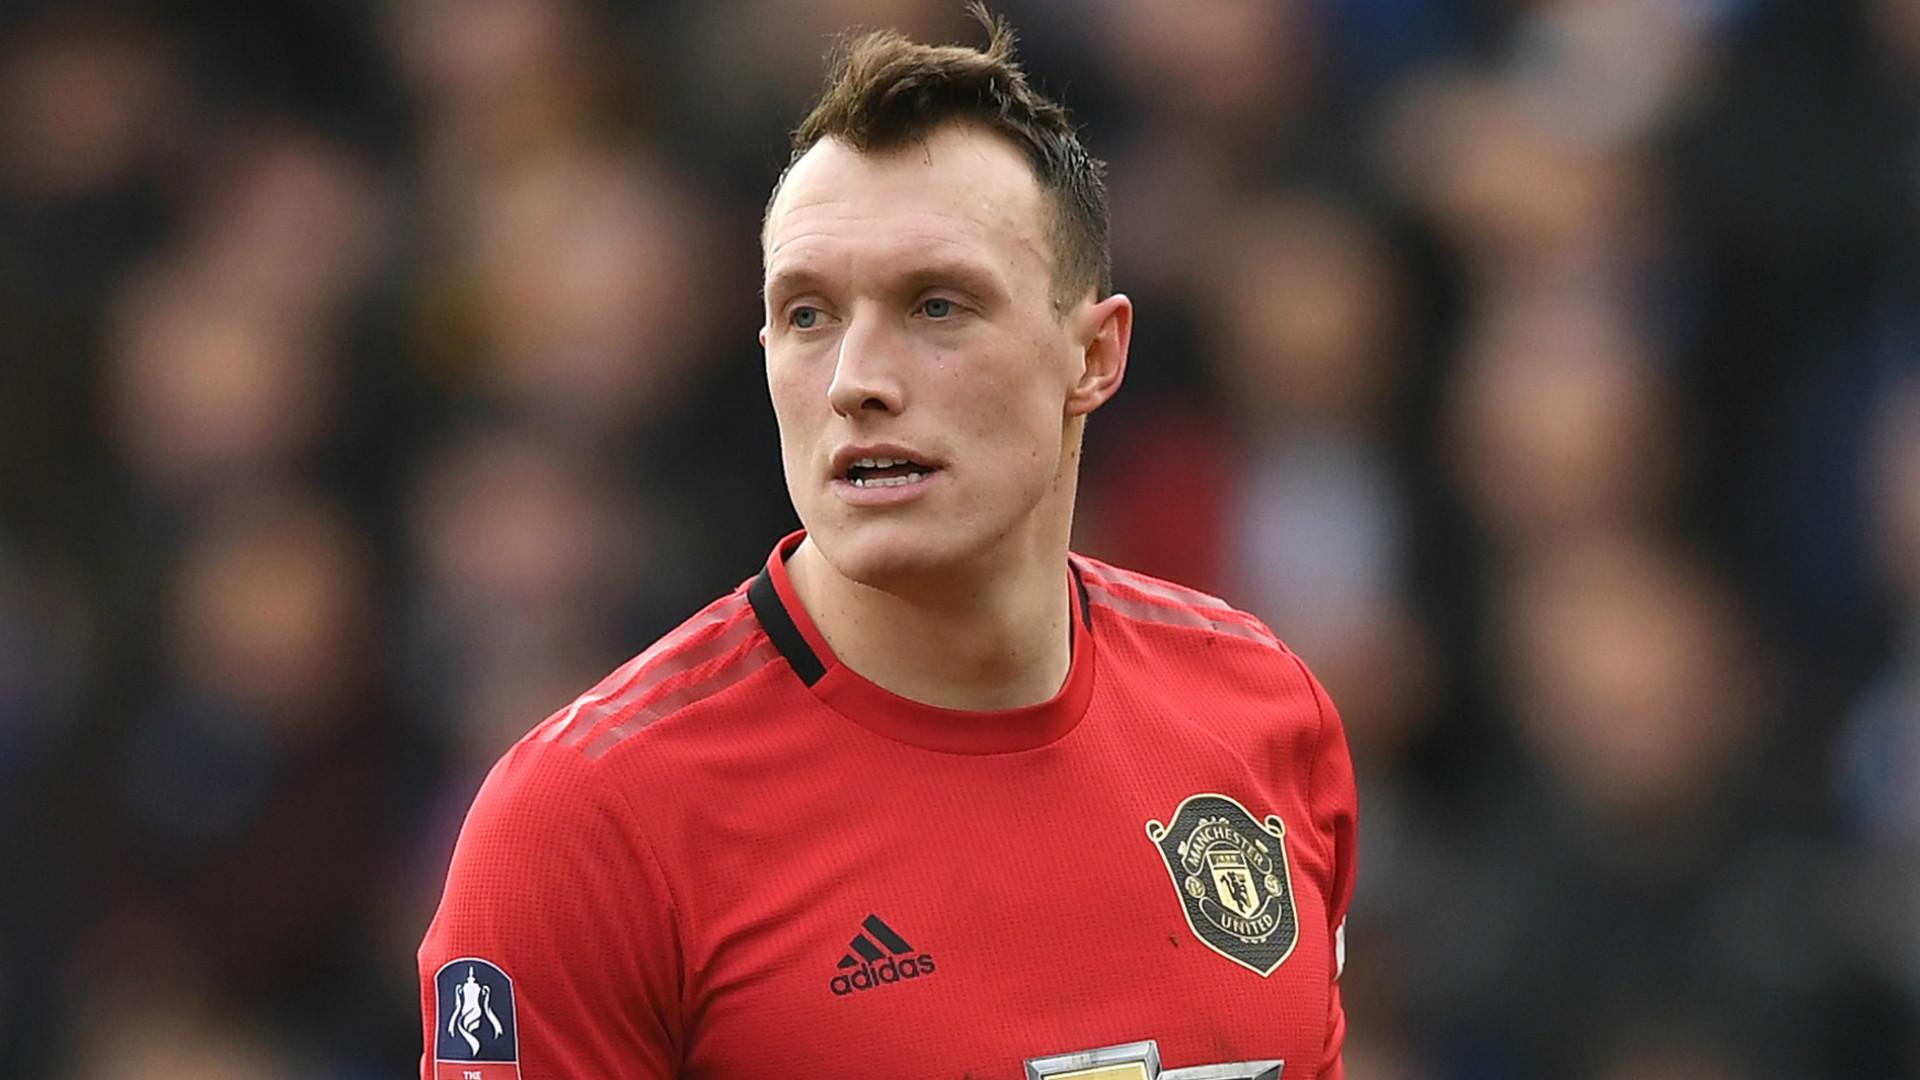 Jones offered Man Utd hope after 12 months out as Solskjaer reflects on 'disheartening' spell for defender